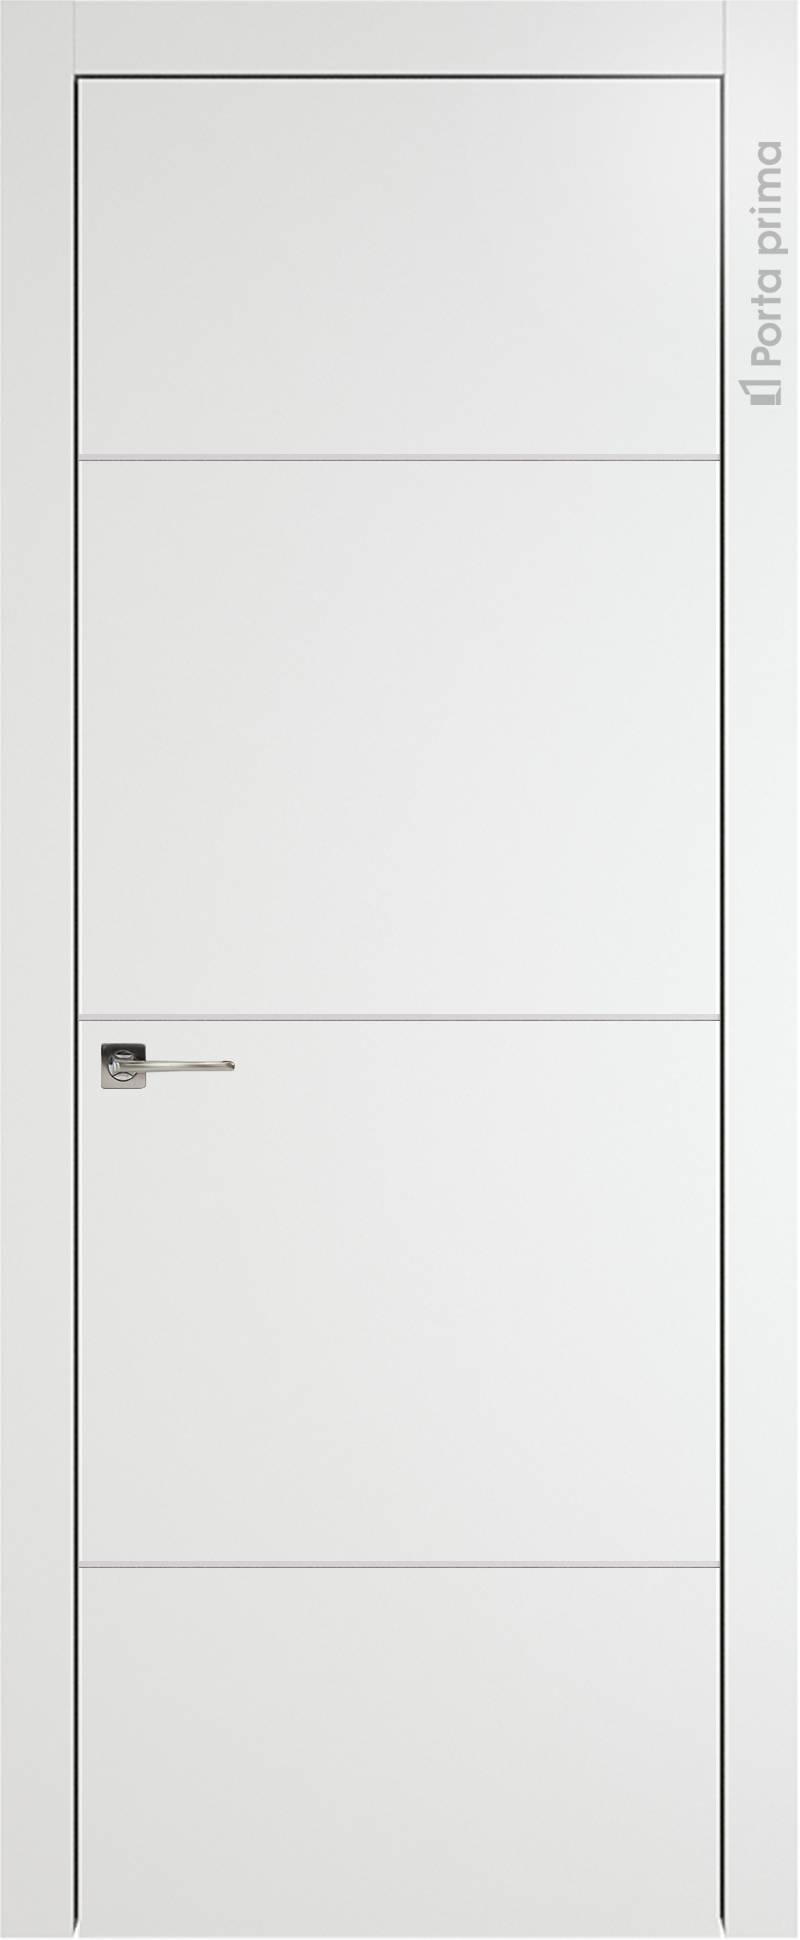 Tivoli Г-3 цвет - Белая эмаль (RAL 9003) Без стекла (ДГ)